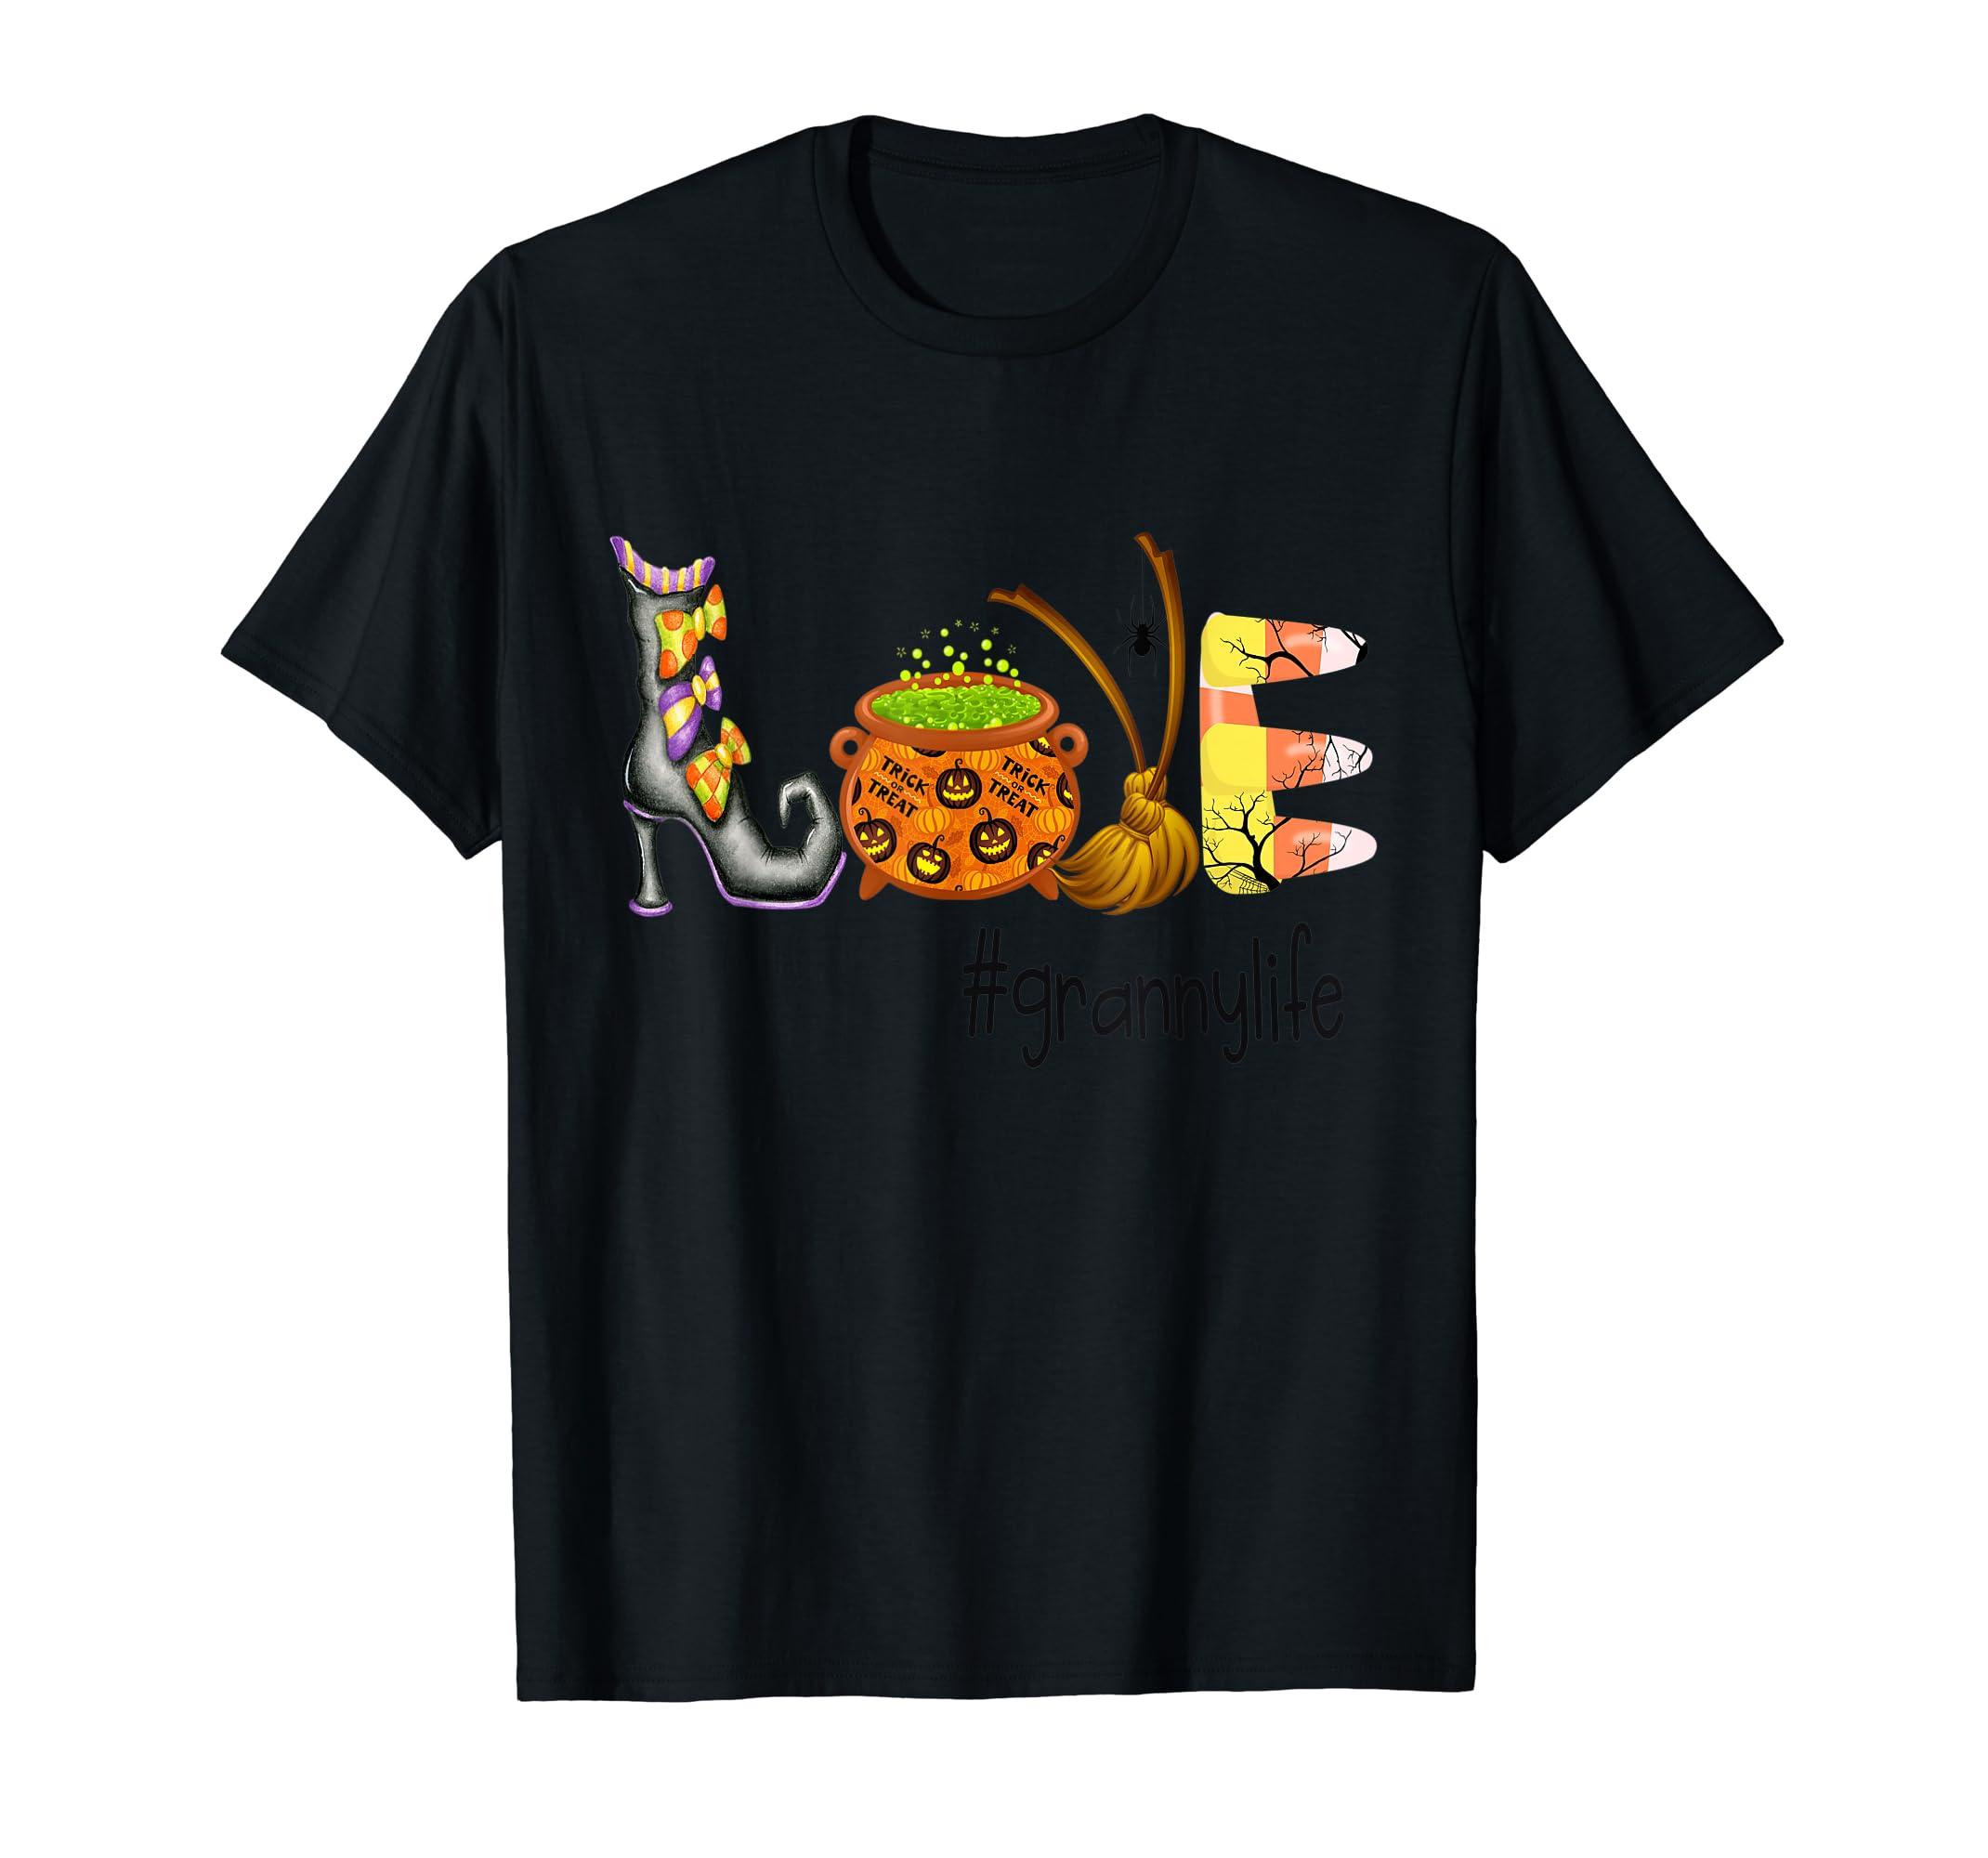 Love #Grannylife Tshirt - Halloween Tshirt-Men's T-Shirt-Black